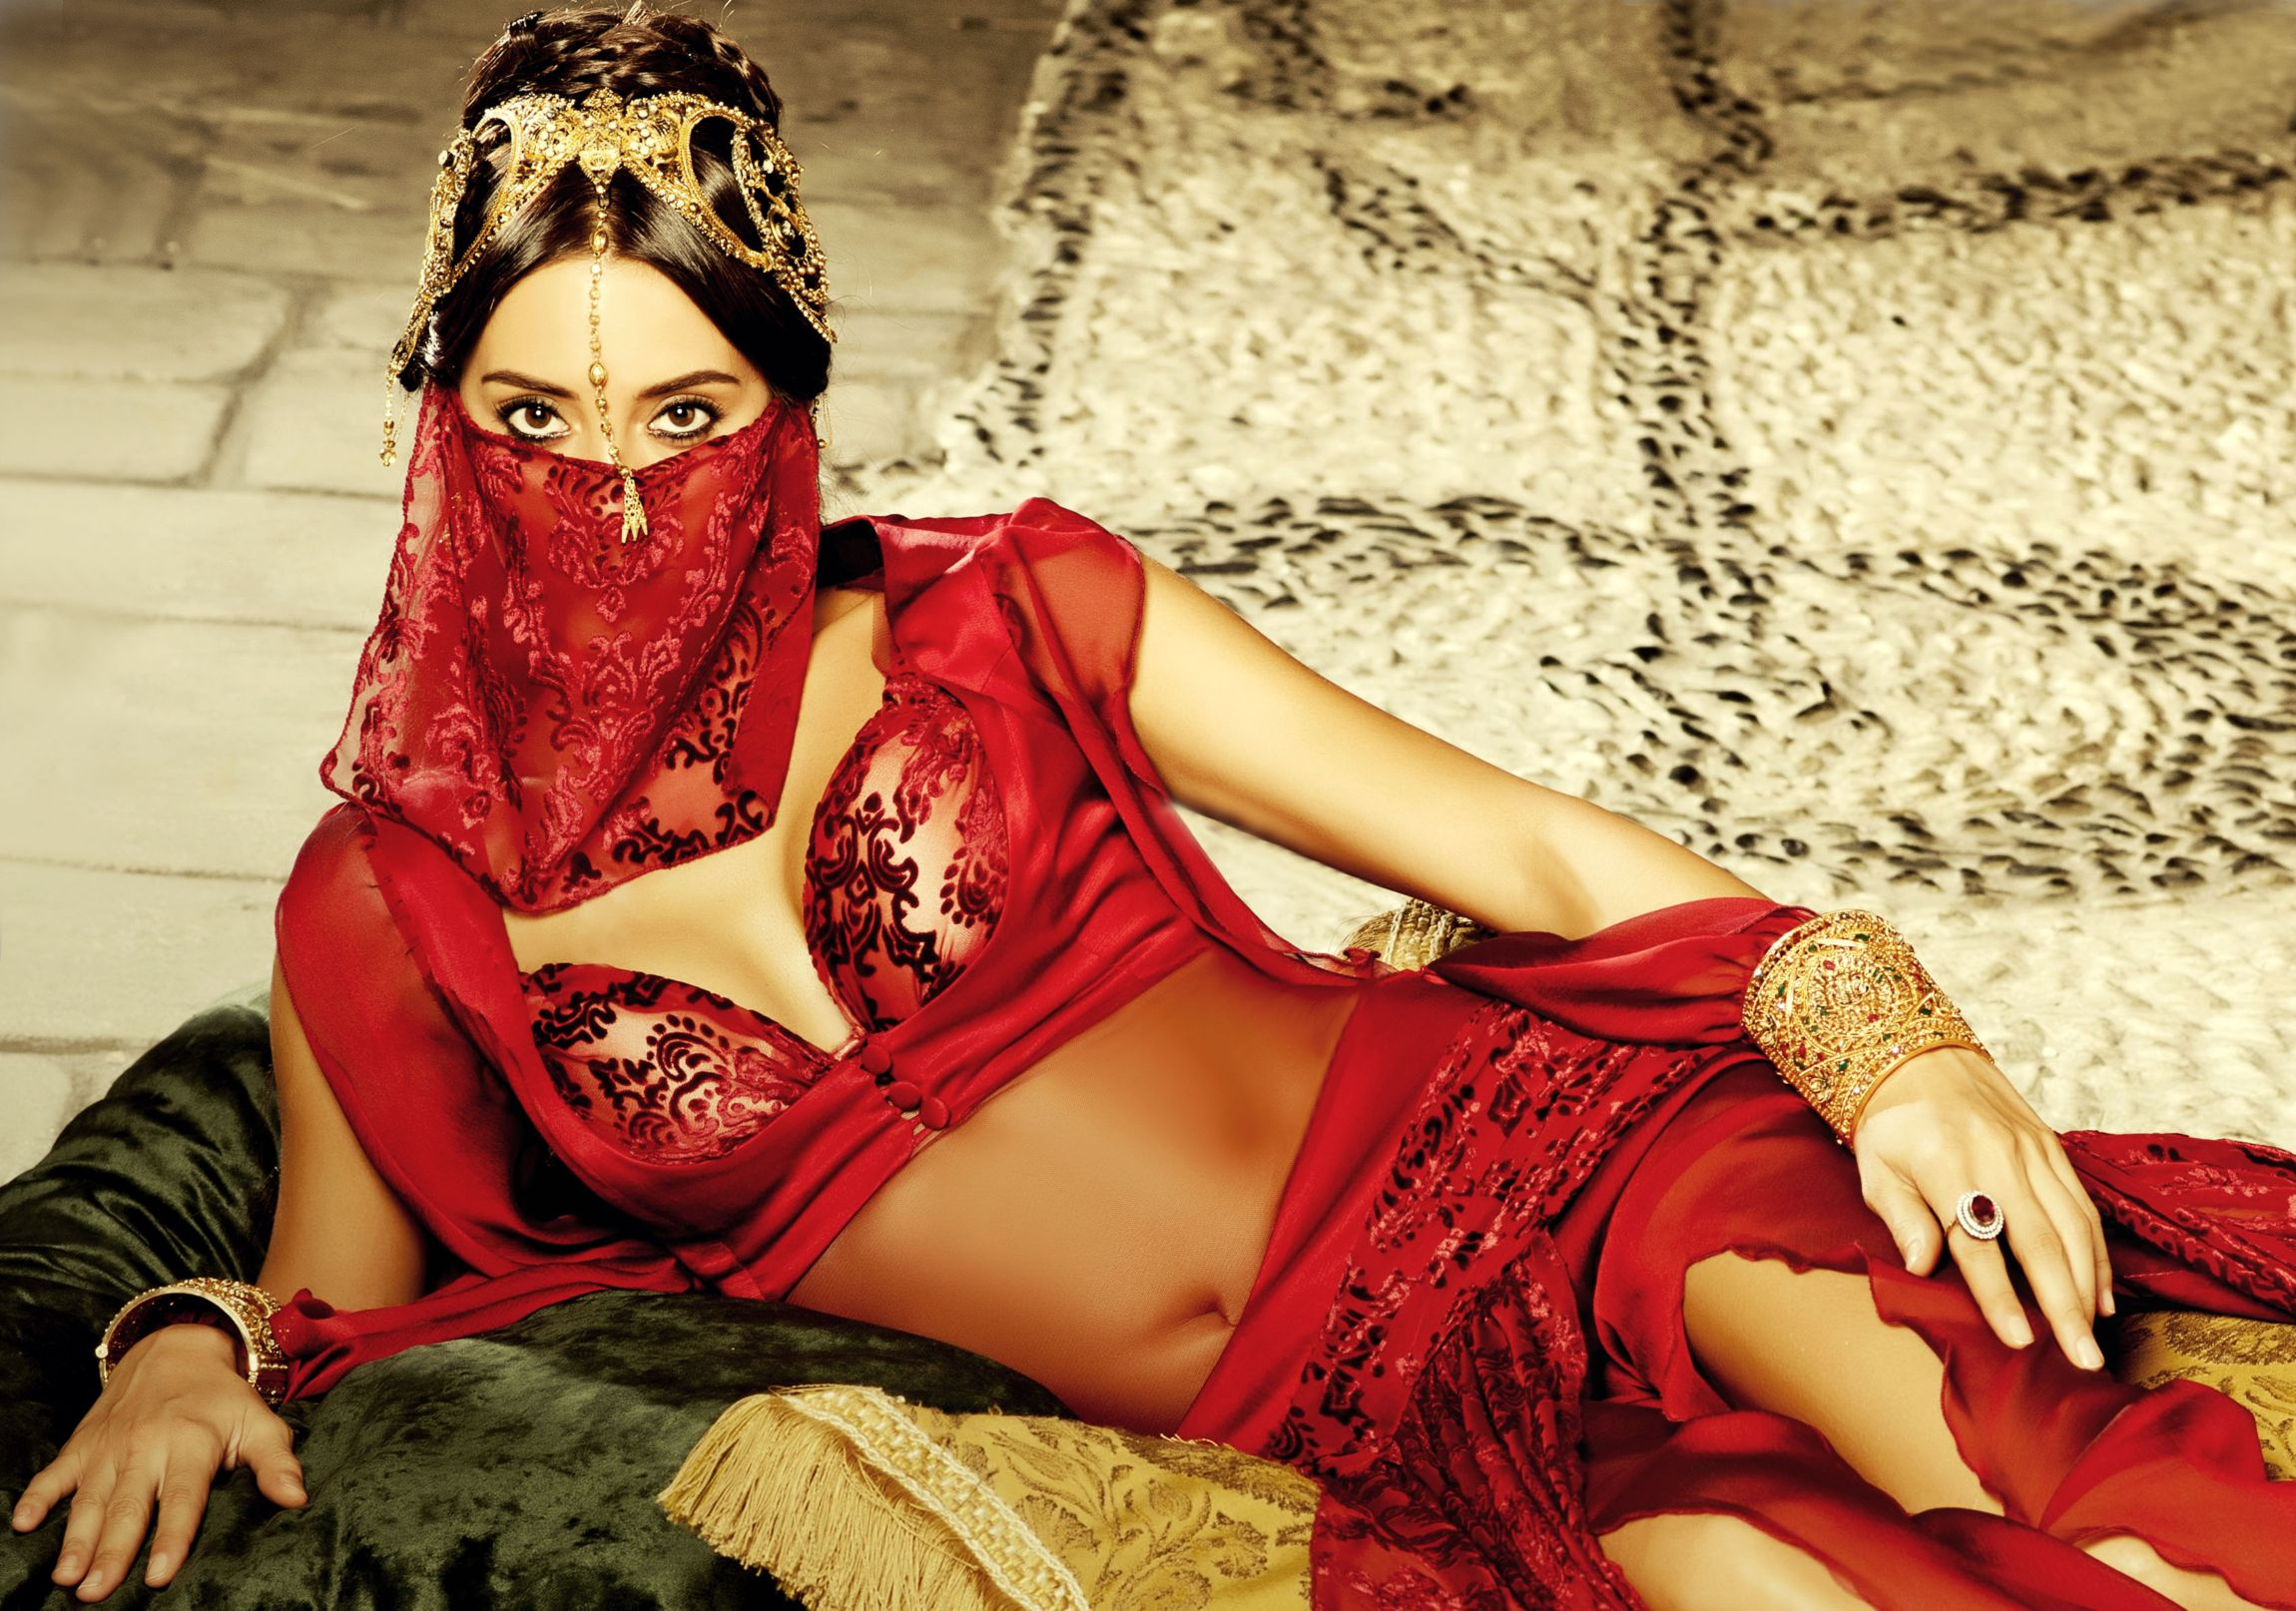 Film sexy arabic